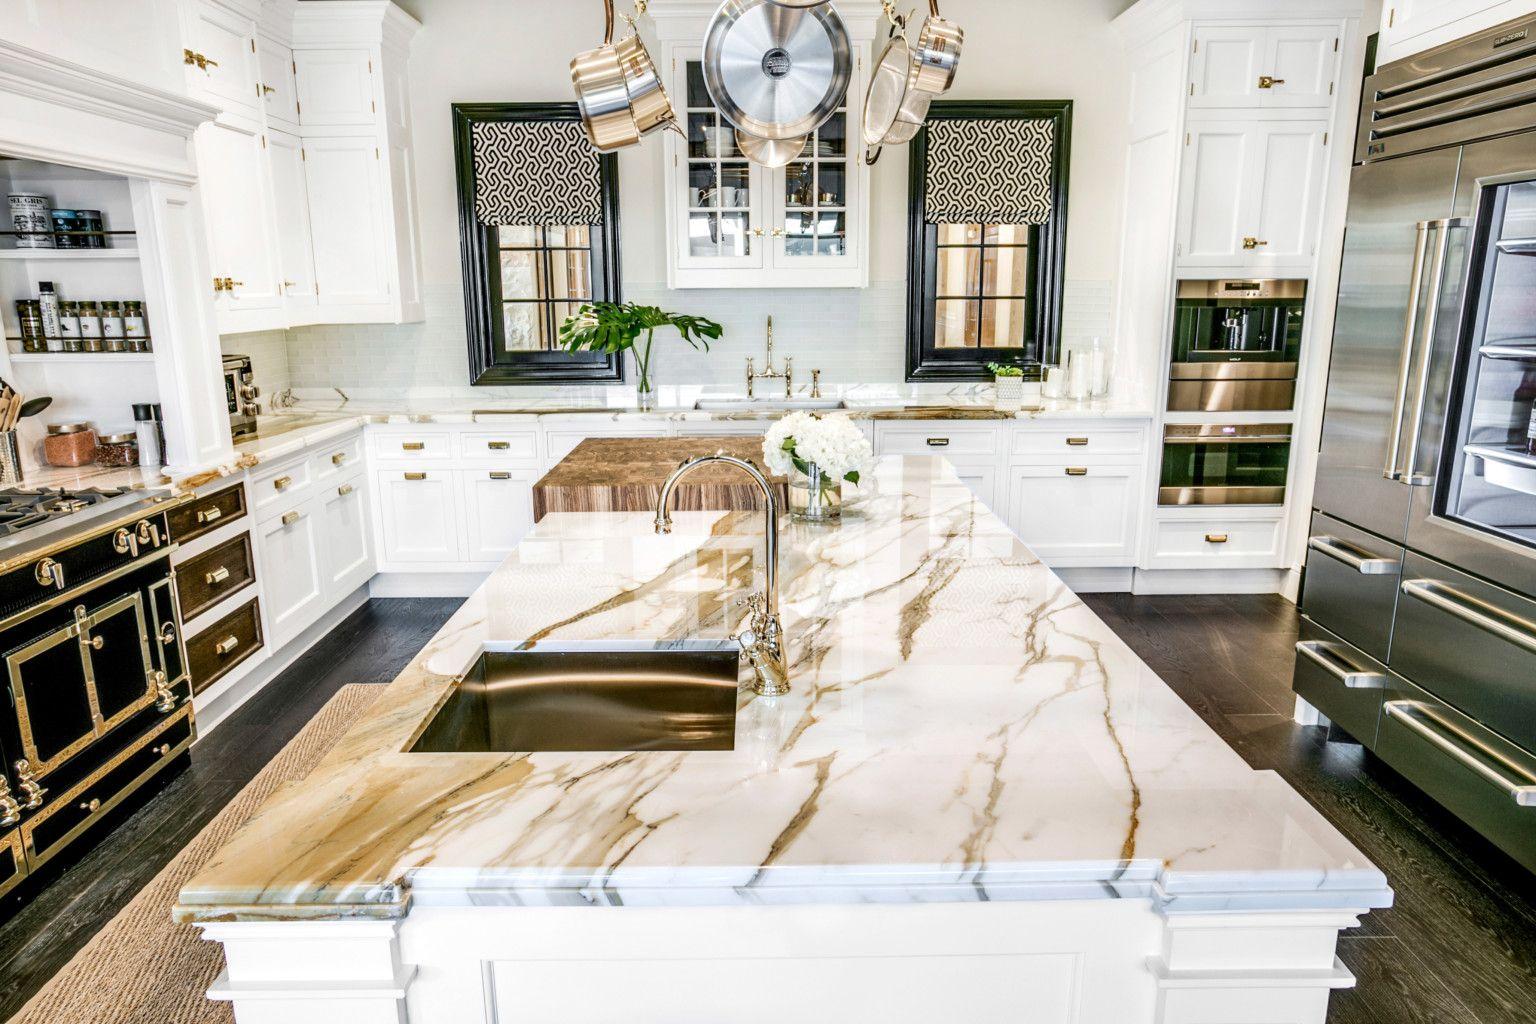 Traditional Calacatta Gold Borghini Extra Marble Kitchen Aria Stone Gallery Kitchen Marble Calacatta Gold Diy Kitchen Countertops